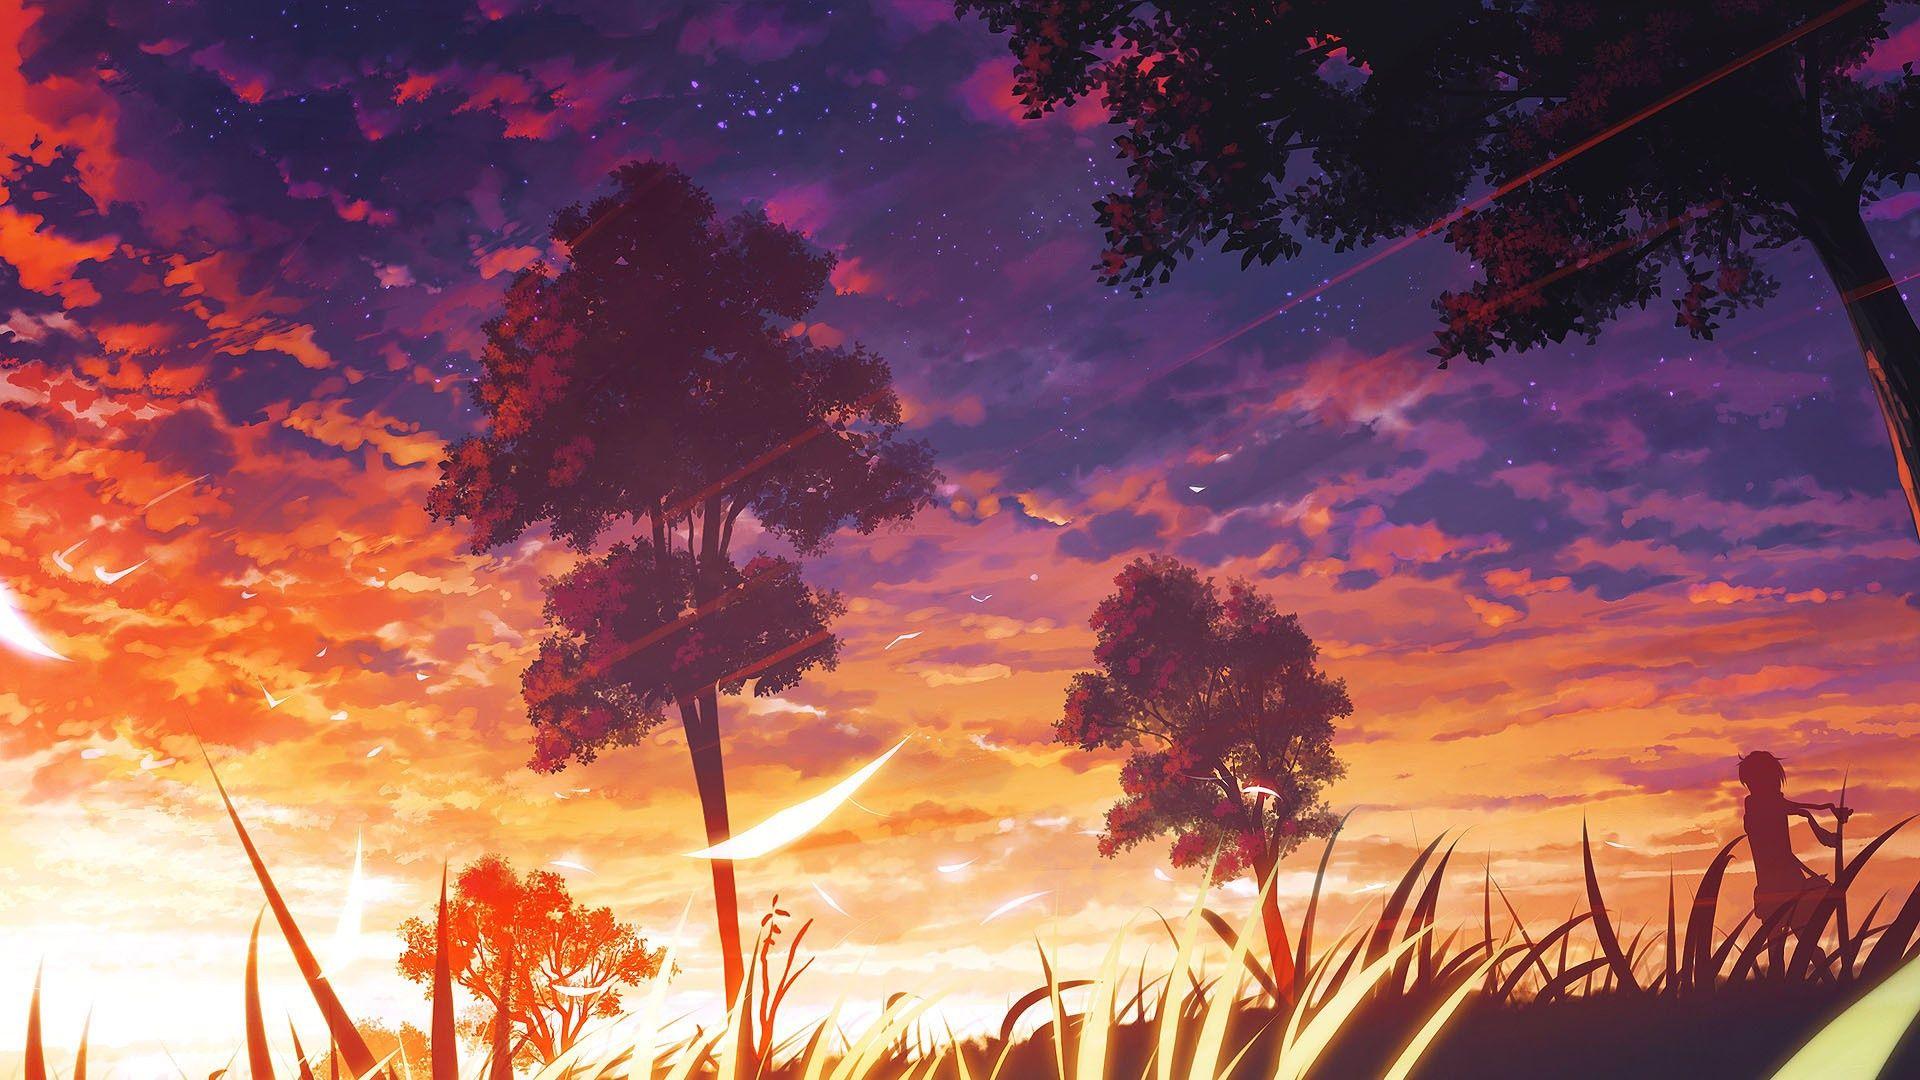 Sunset Scenery Pemandangan Anime Pemandangan Latar Belakang